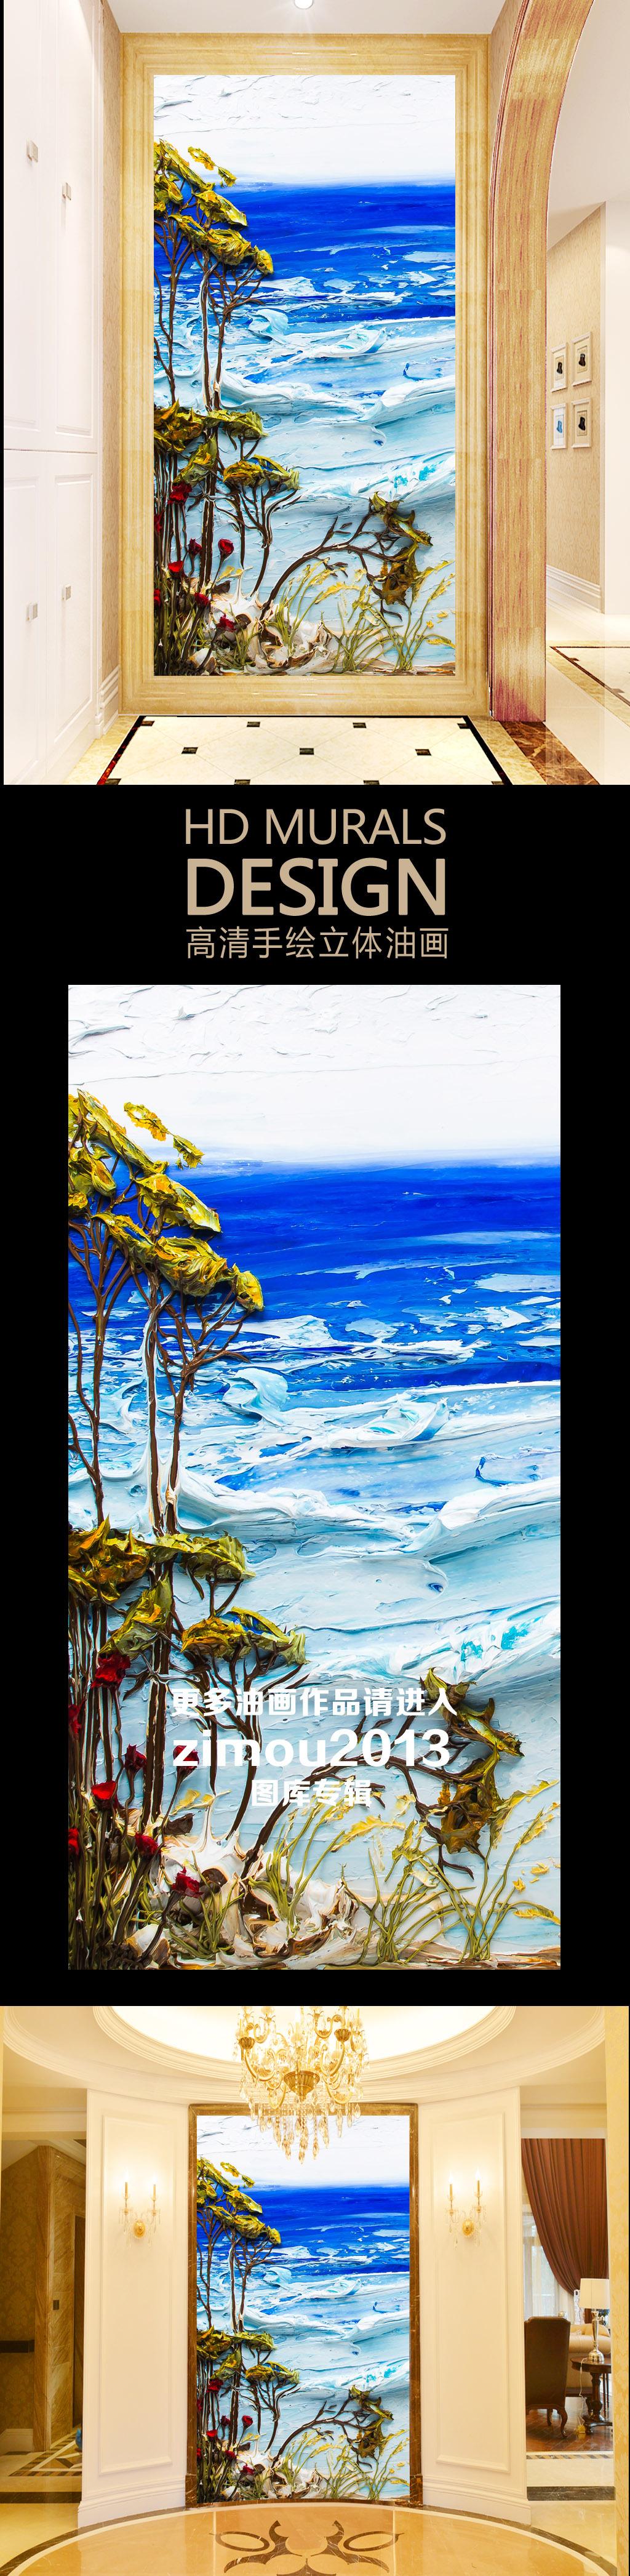 3d立体手绘风景画油画浮雕壁画玄关门厅